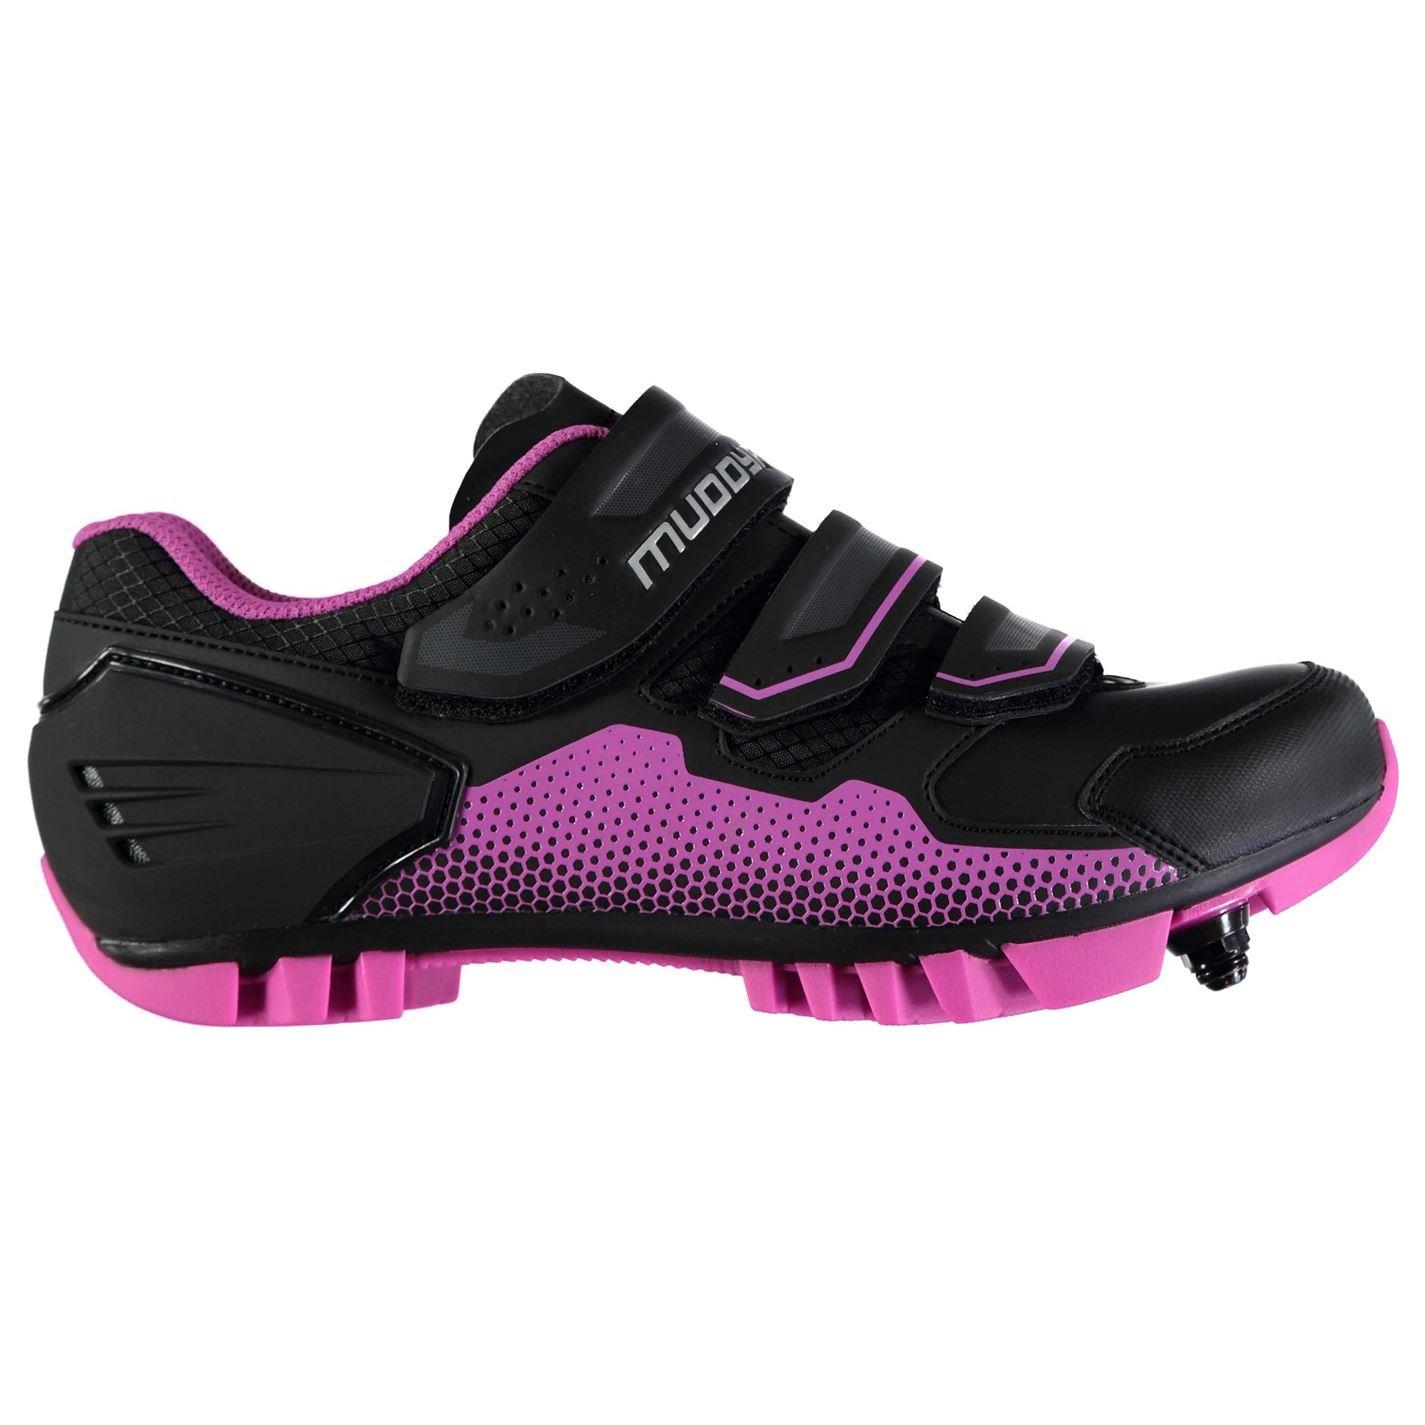 Muddyfox Womens MTB100 Cycling Shoes Waterproof Lightweight Mesh Breathable Black/Pink UK 6.5 (40)